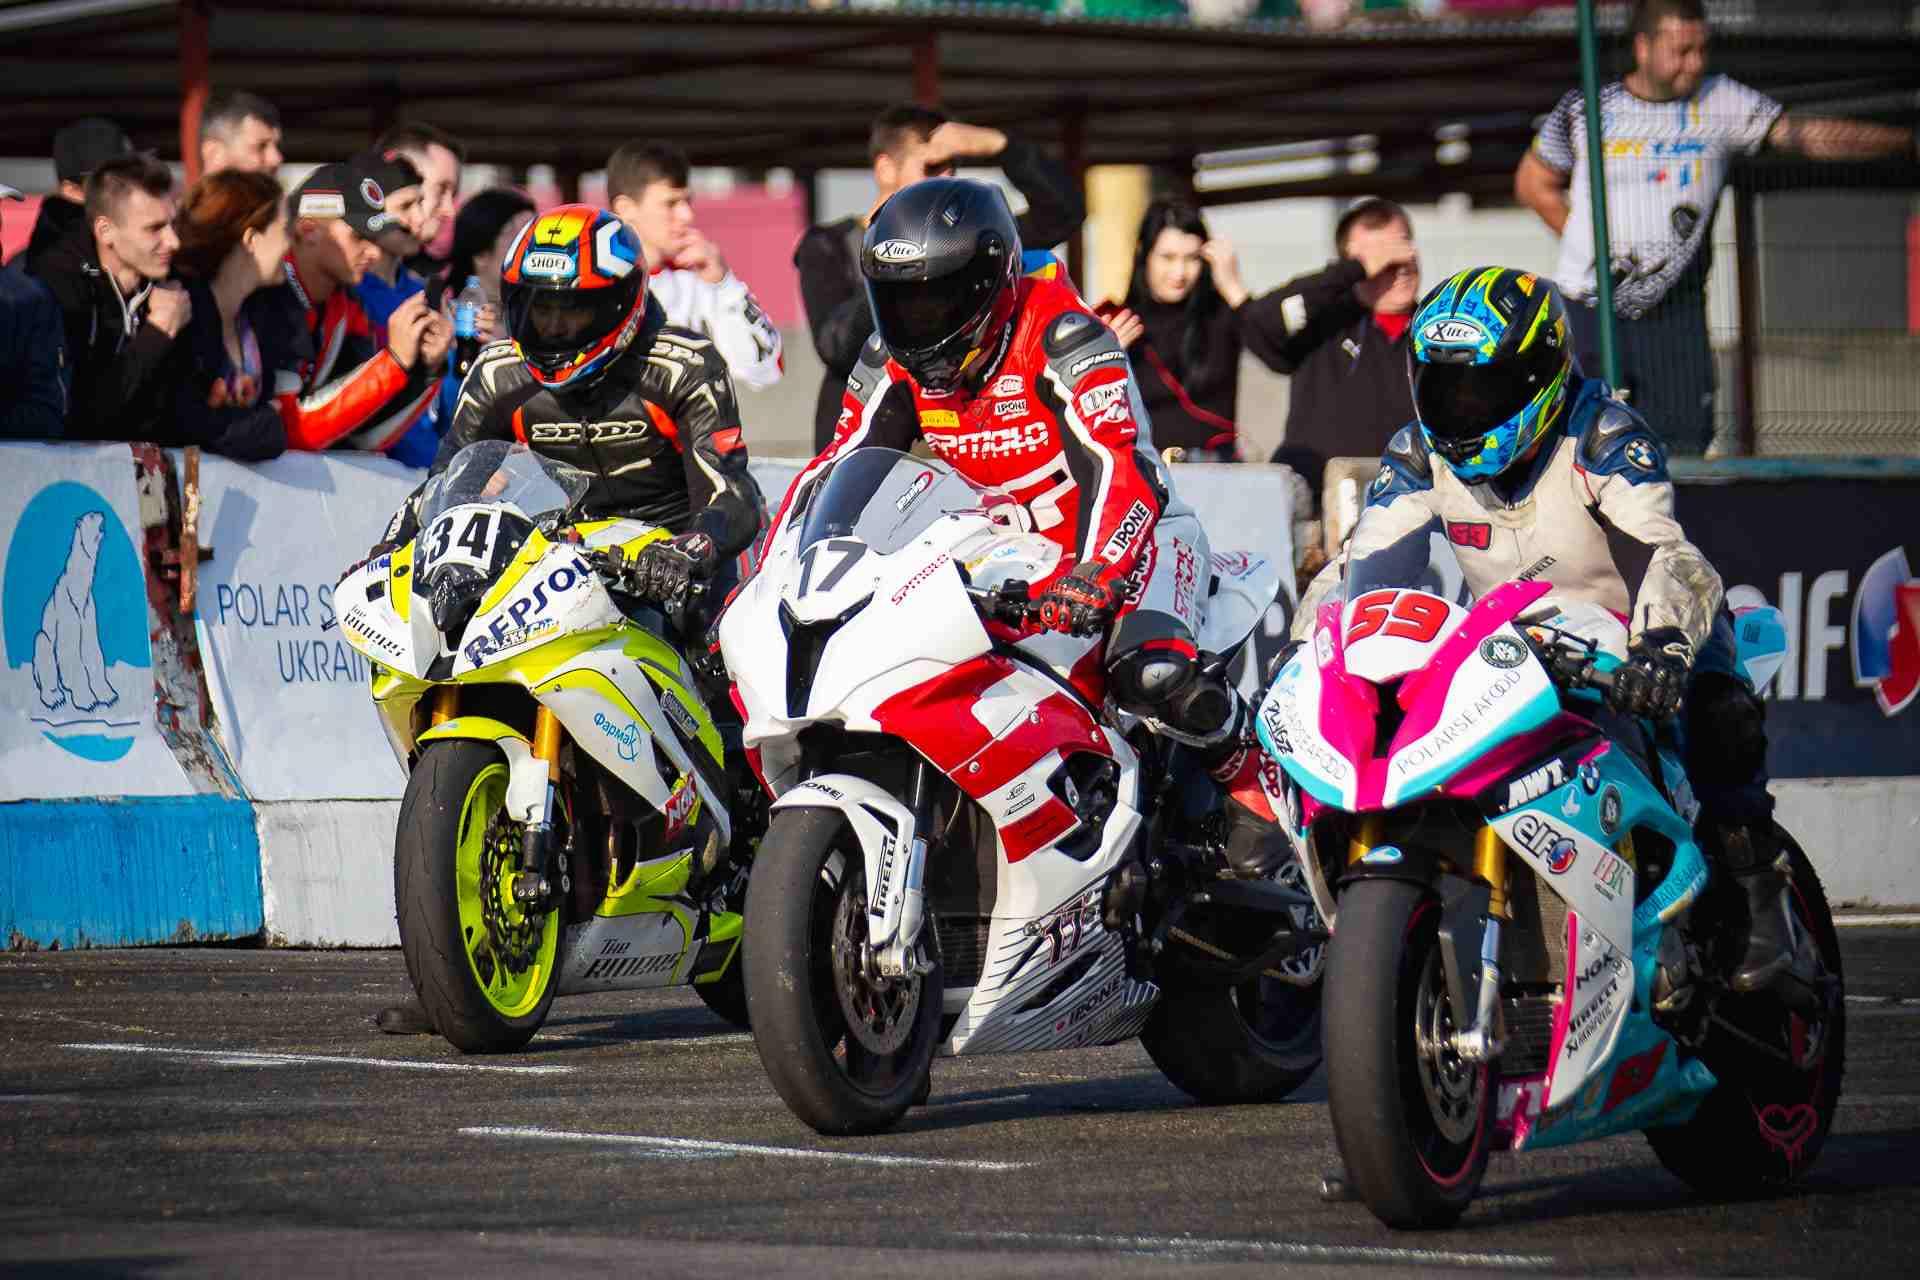 5-6_etap_MotoGPUkraine_115